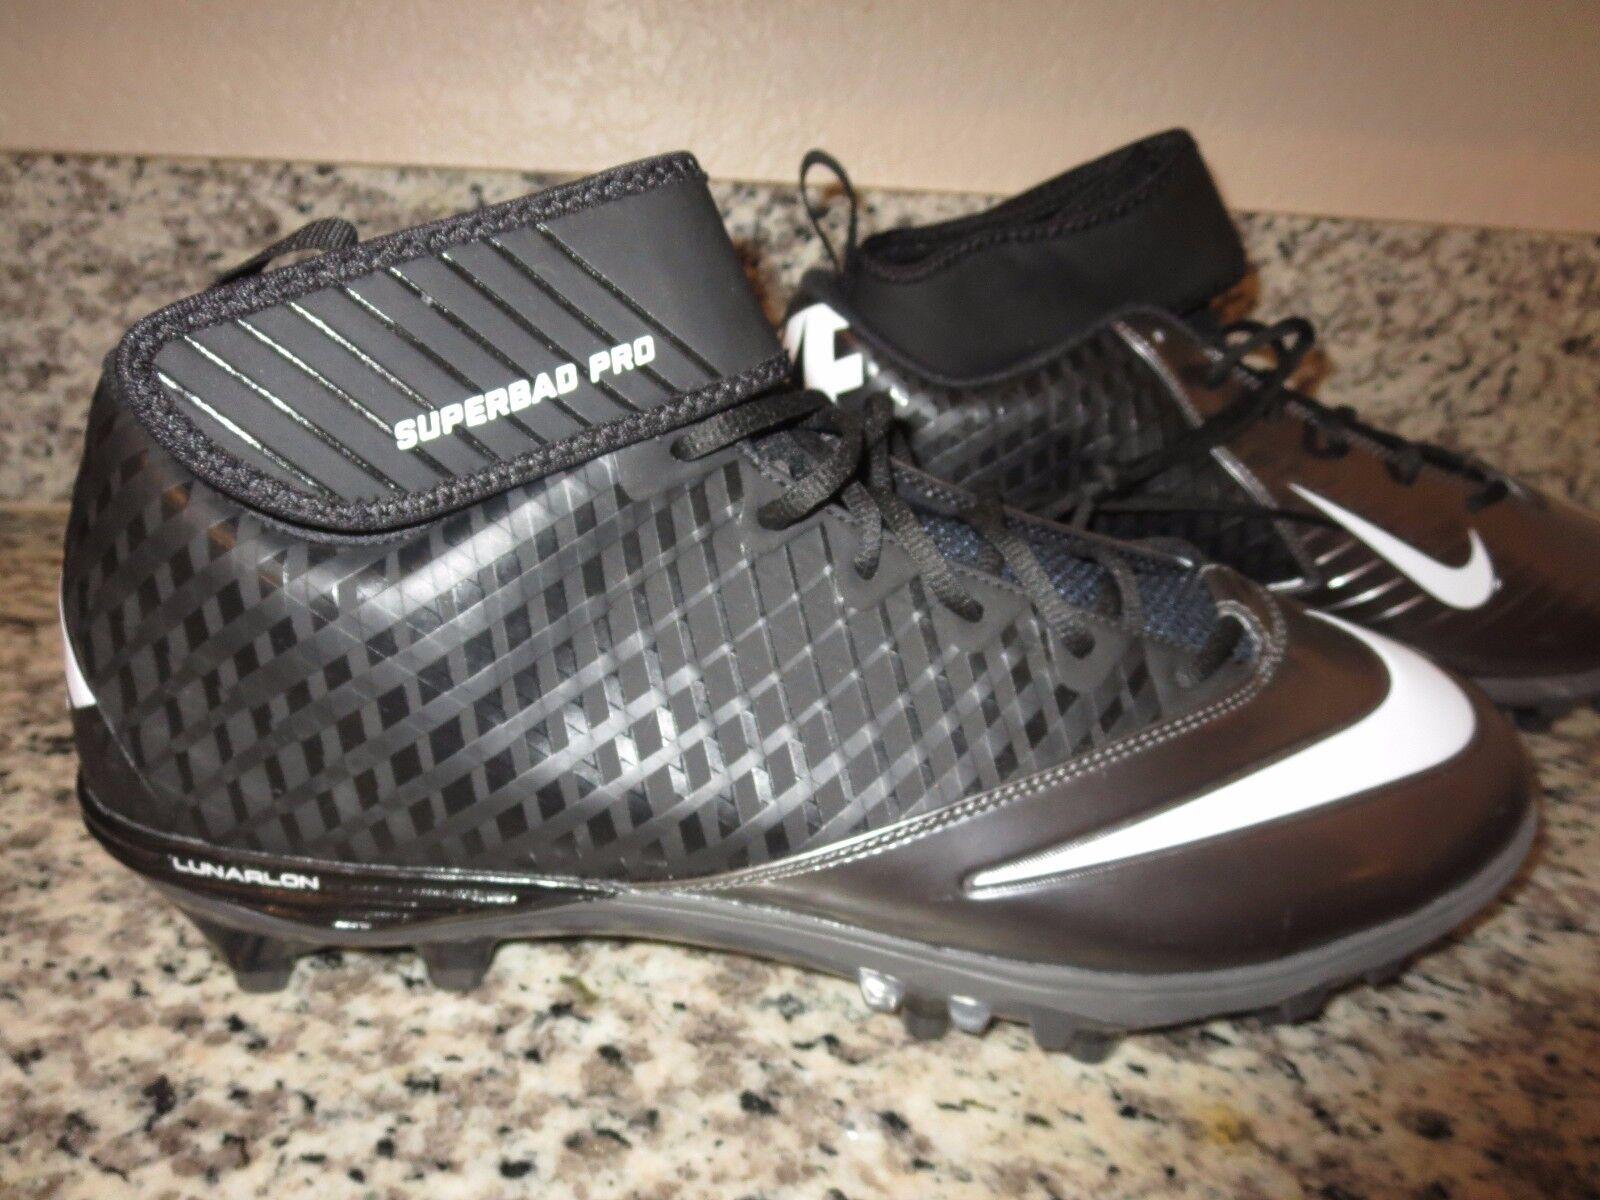 Nike football lunarlon superbad pro calcio scarpe Uomo noi 16 uk15